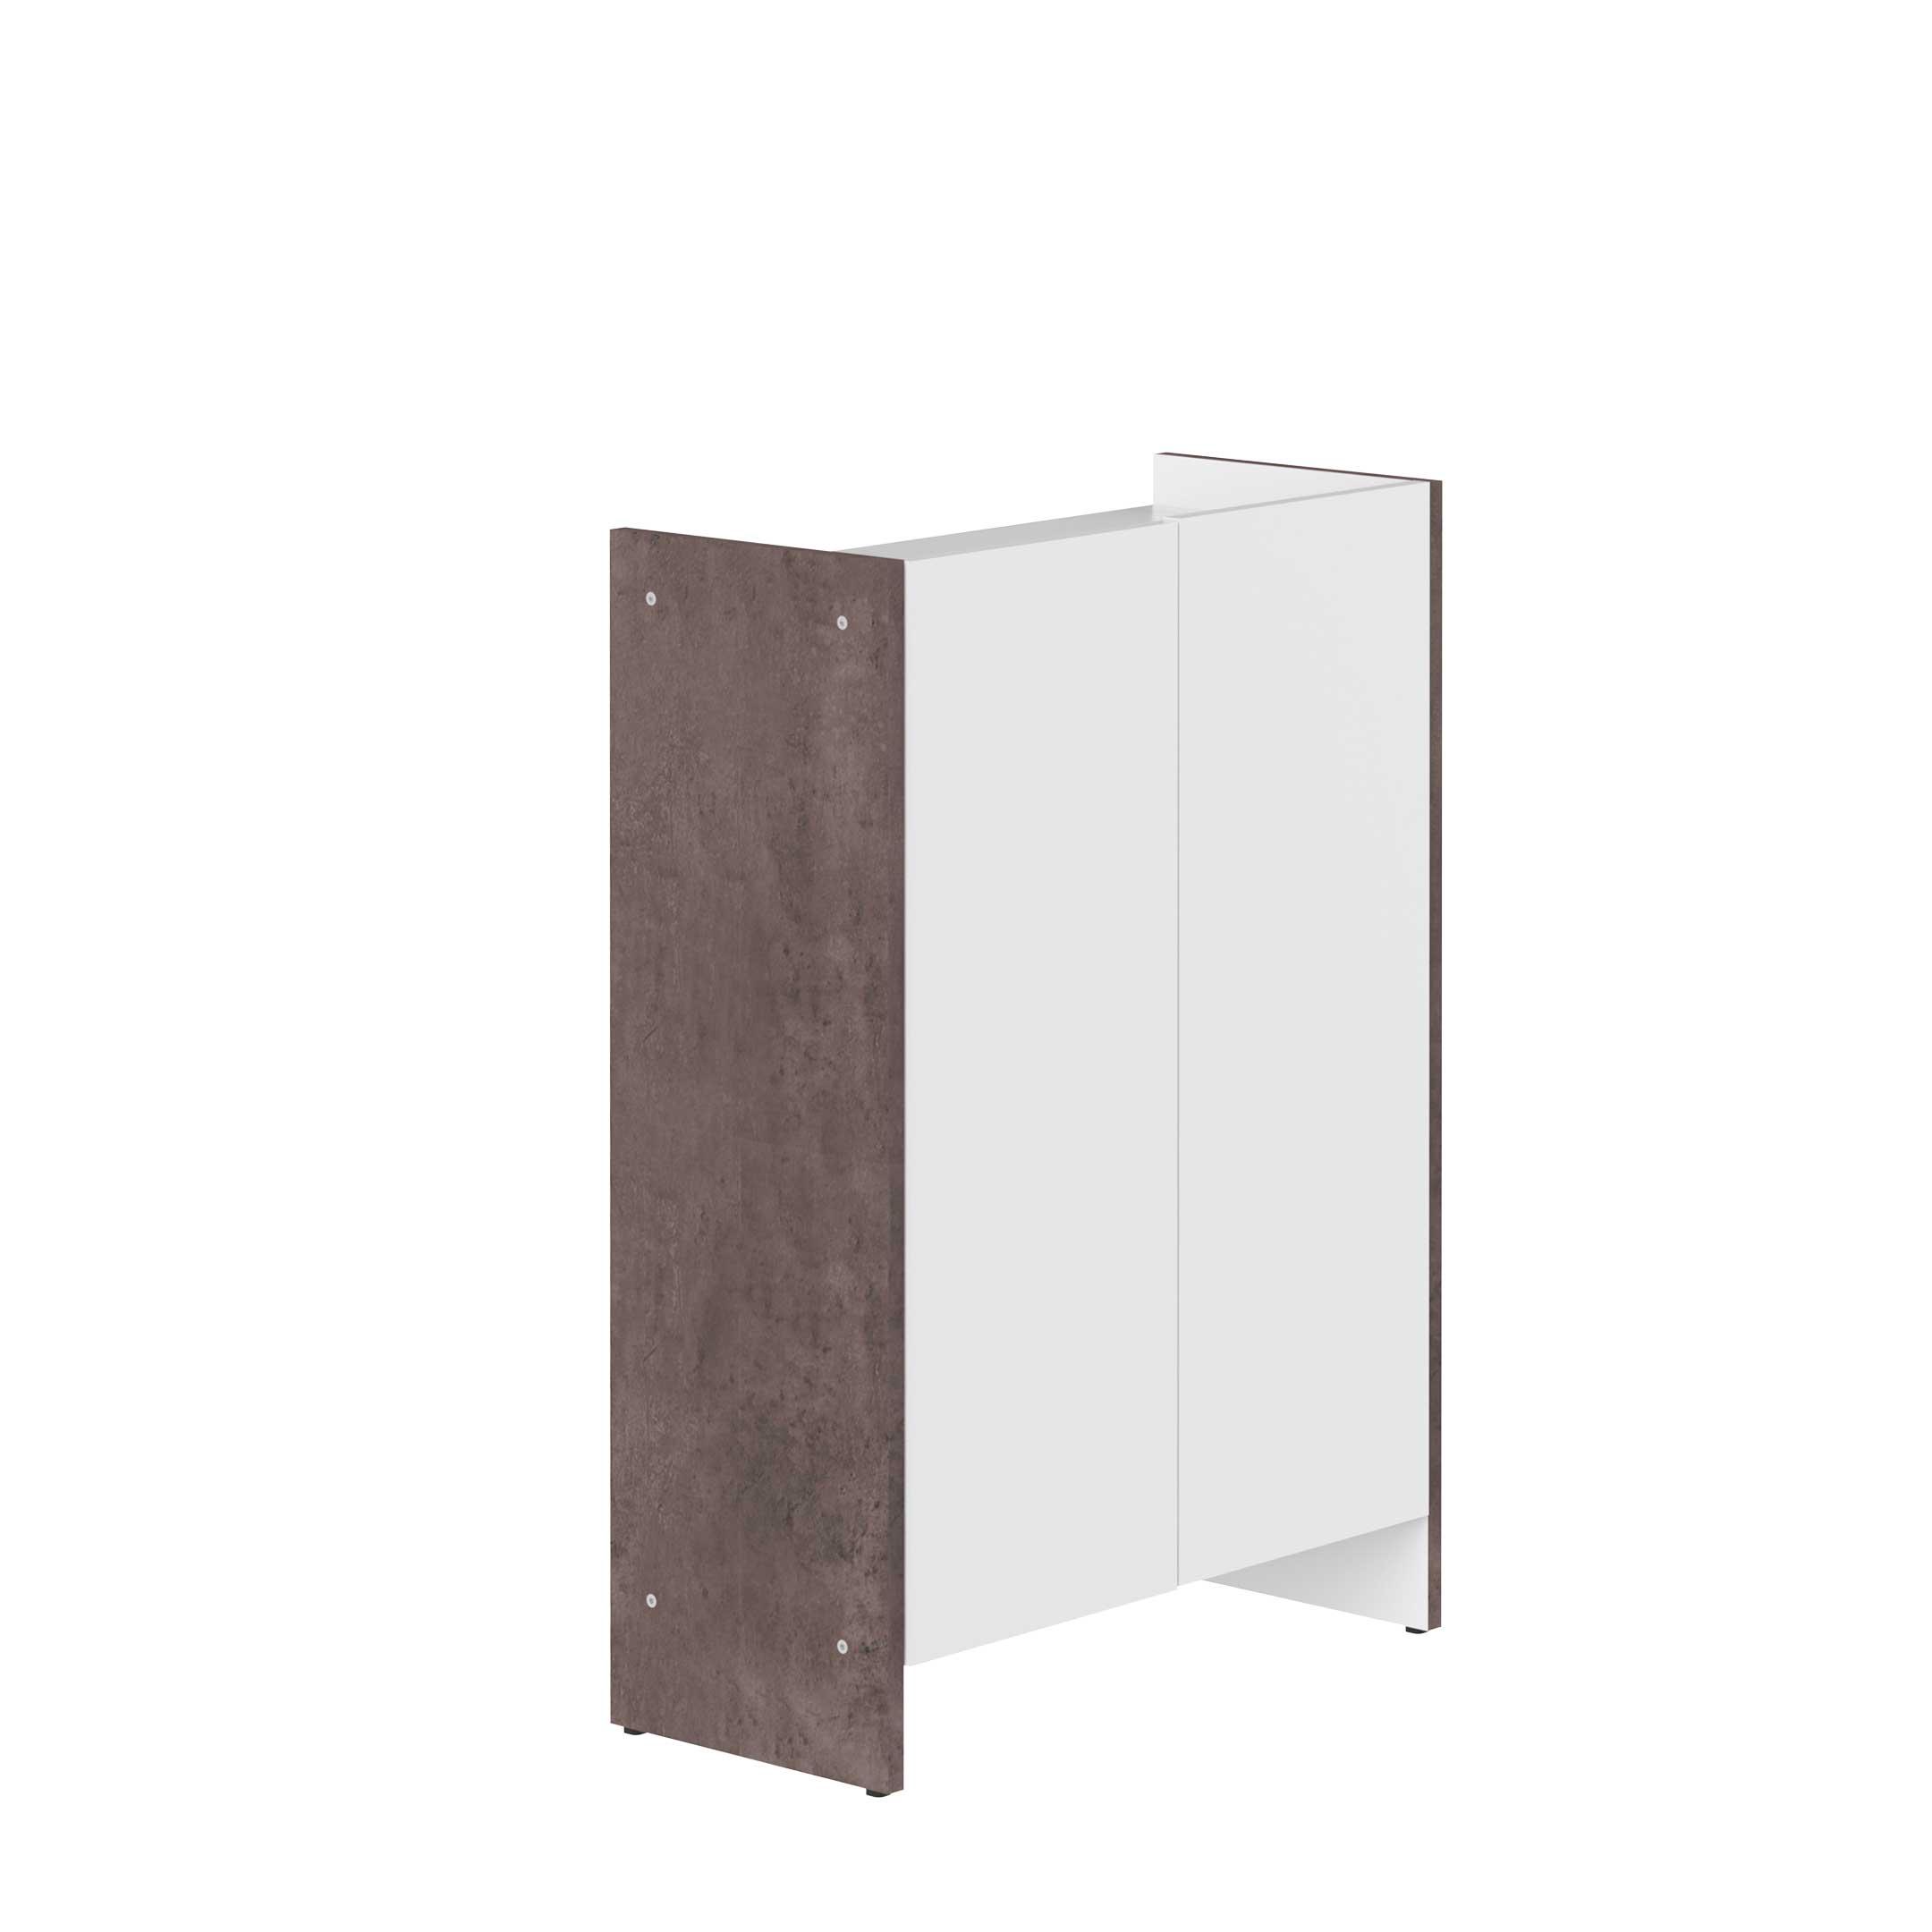 Badkamerkastje Biarritz wit beton